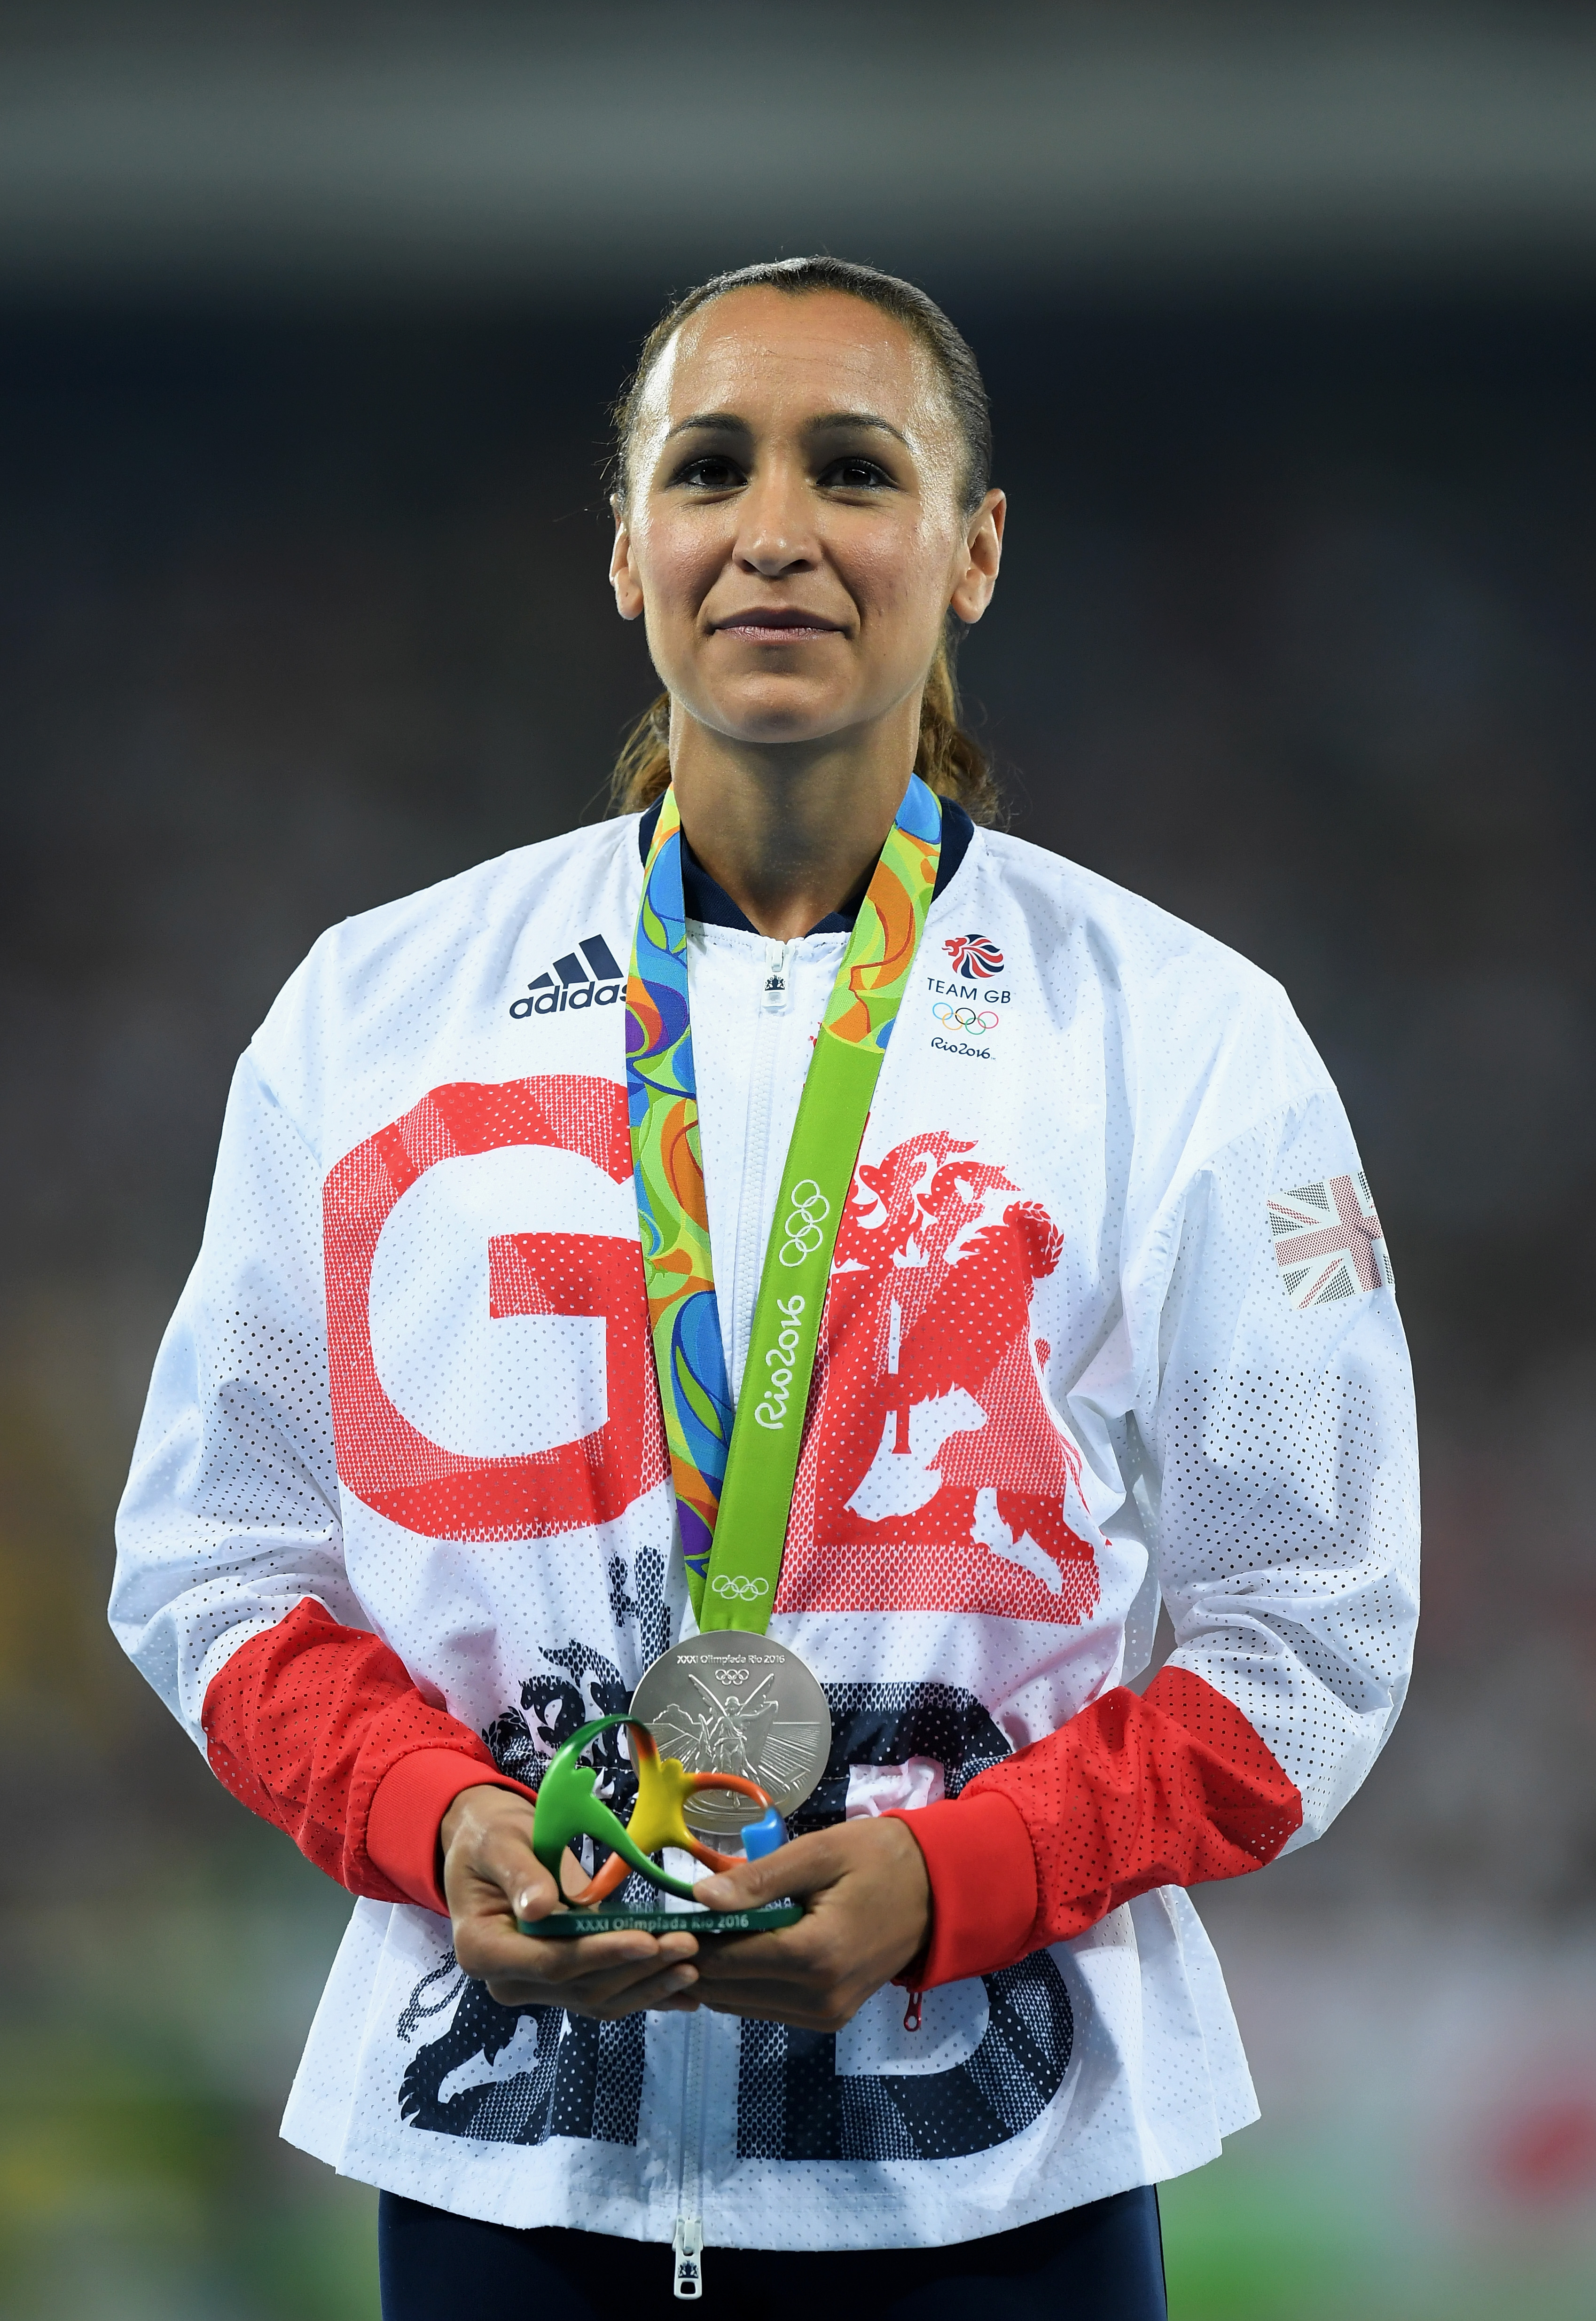 Атлетката и олимпийска златна медалистка Джесика Енис-Хил.